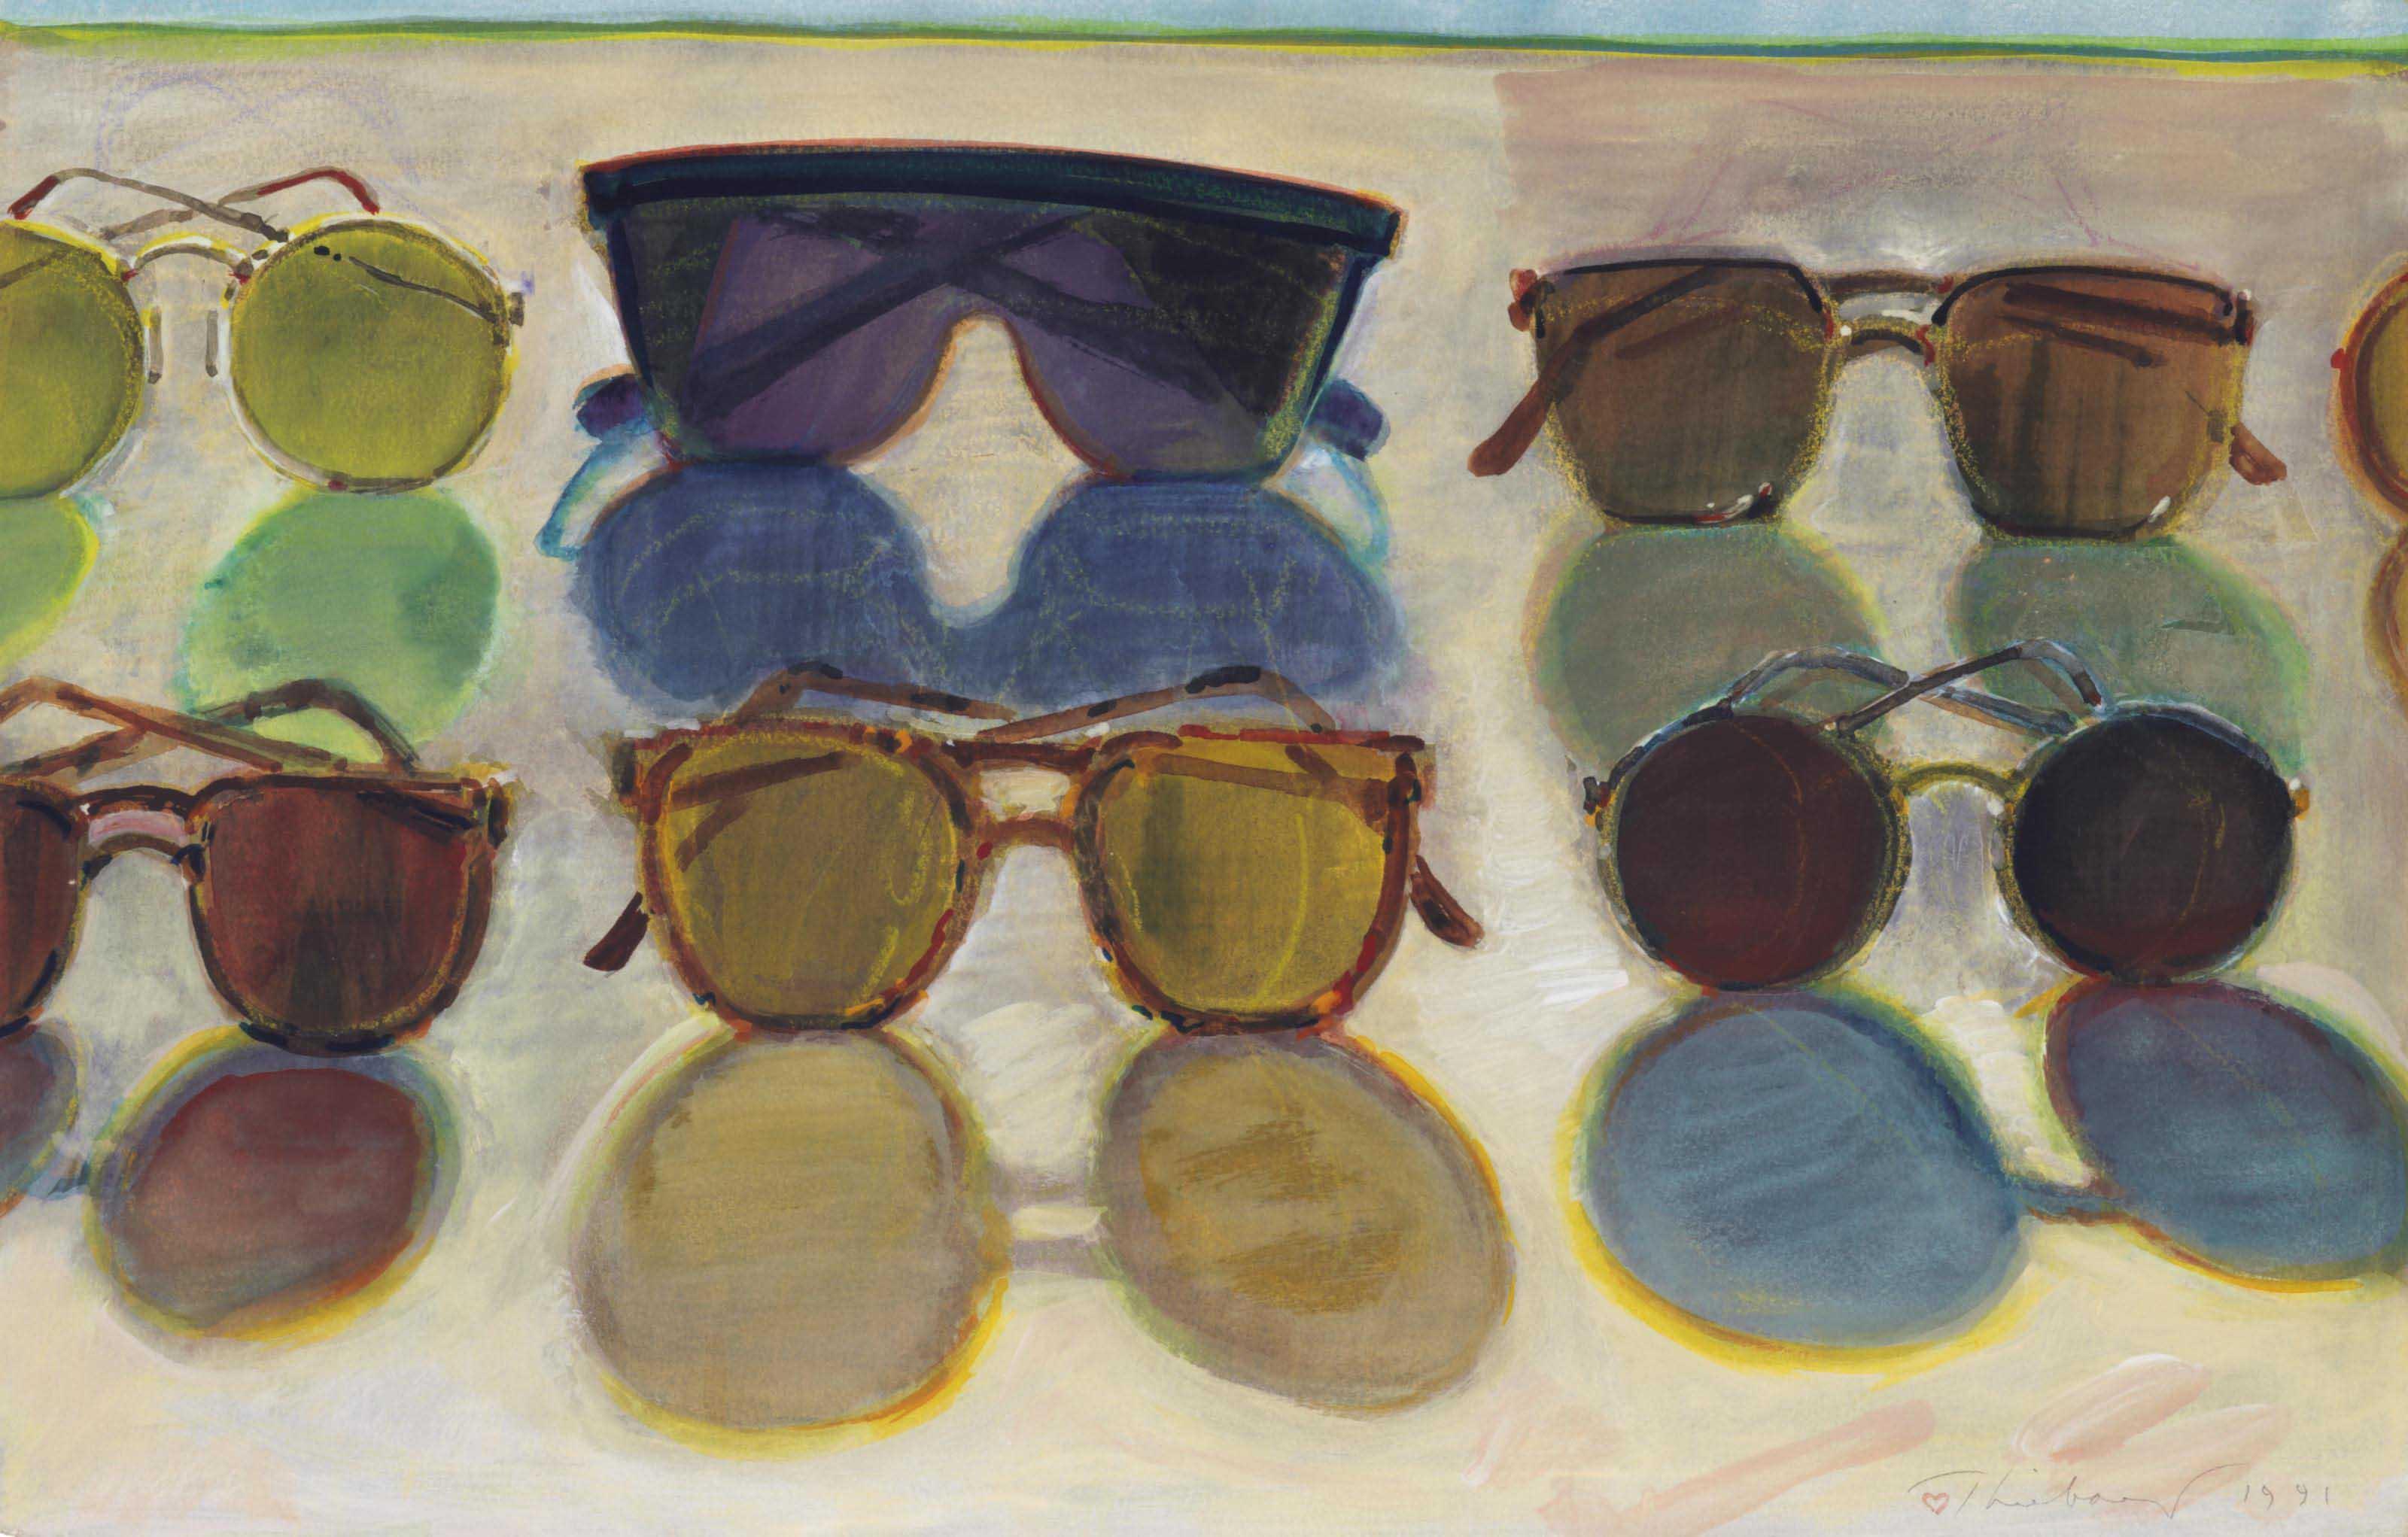 51428350f0e Wayne Thiebaud (b. 1920) | Sunglasses | 1990s, Drawings ...